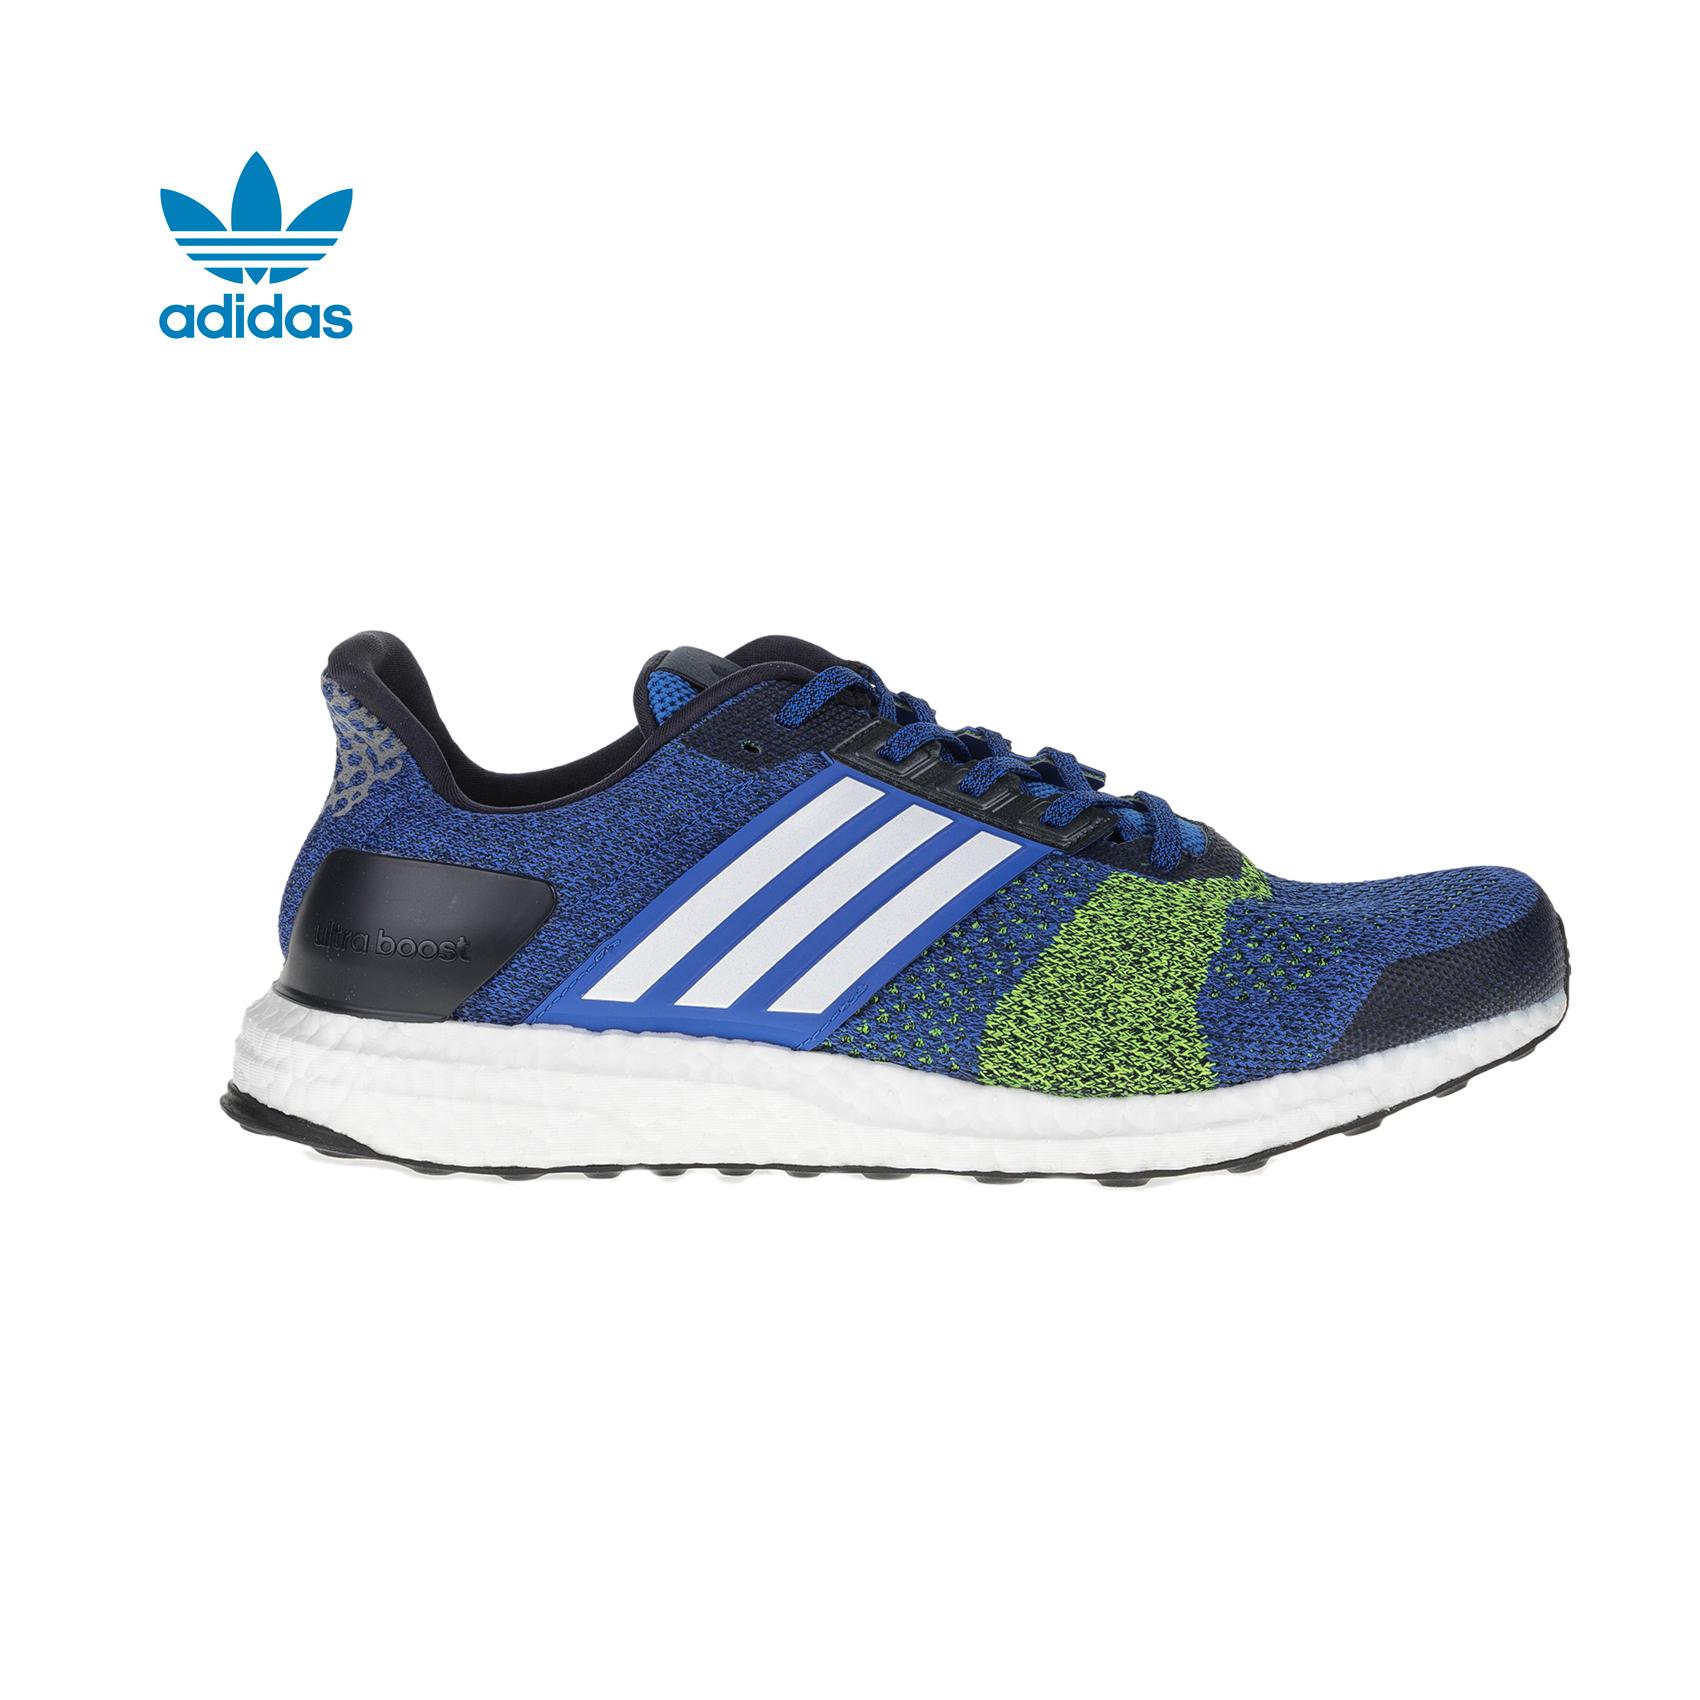 adidas Originals – Ανδρικά παπούτσια adidas adistar boost 3 μπλε